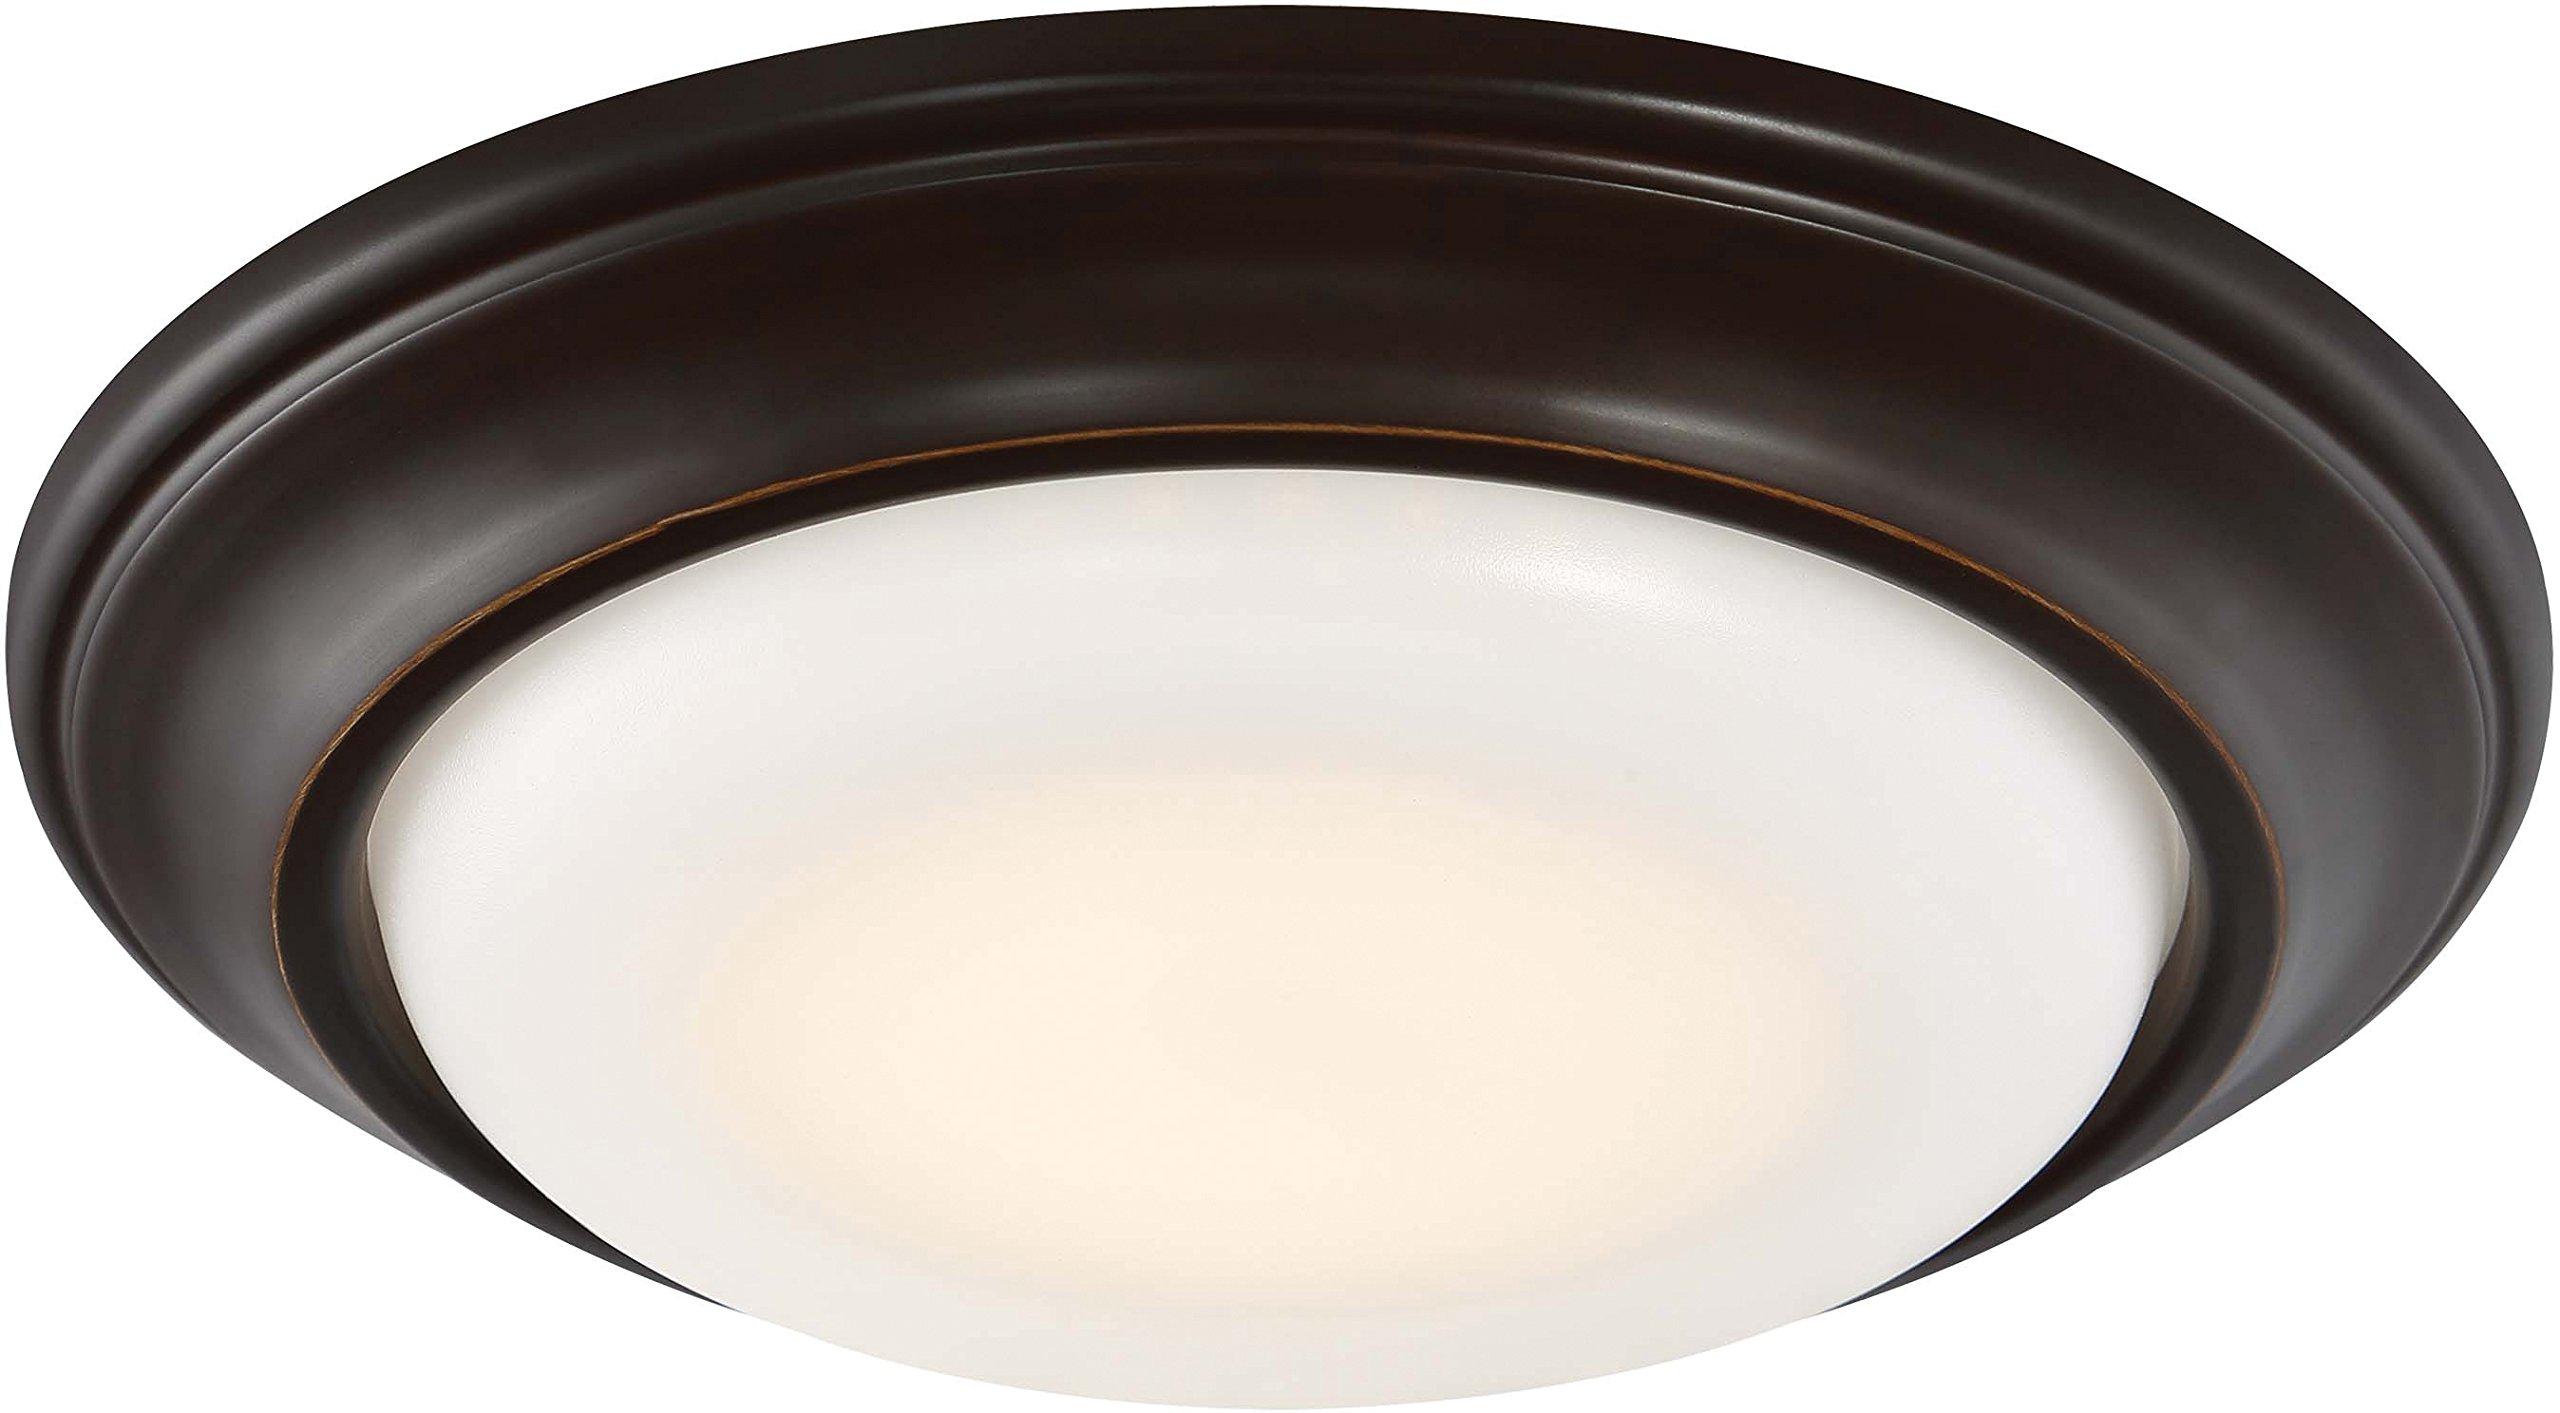 Minka Lavery Recessed Light Retrofit LED 2718-37B-L 6'' Dimmable Kit, 1-Light LED 15 Watts, Dark Restoration Bronze